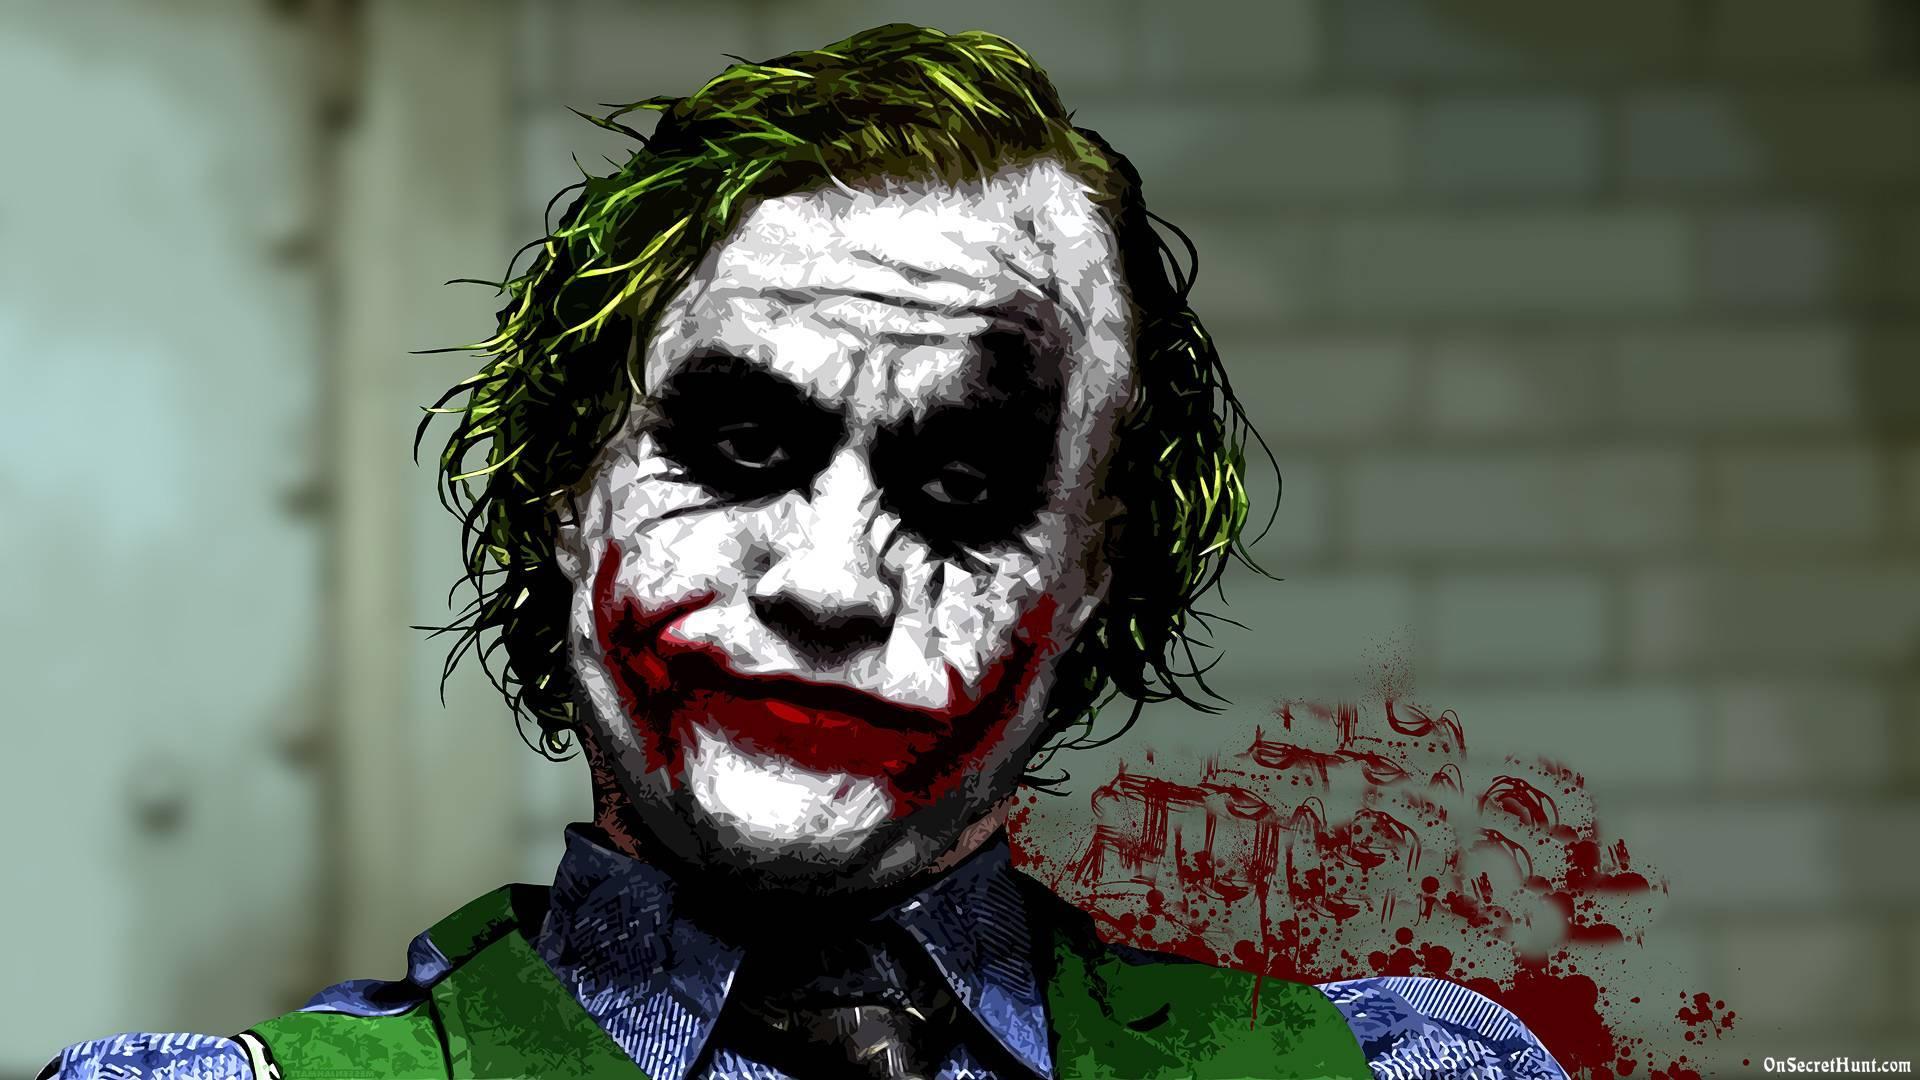 Download-Batman-Joker-Hd-1920x1080PX-wallpaper-wp3604977